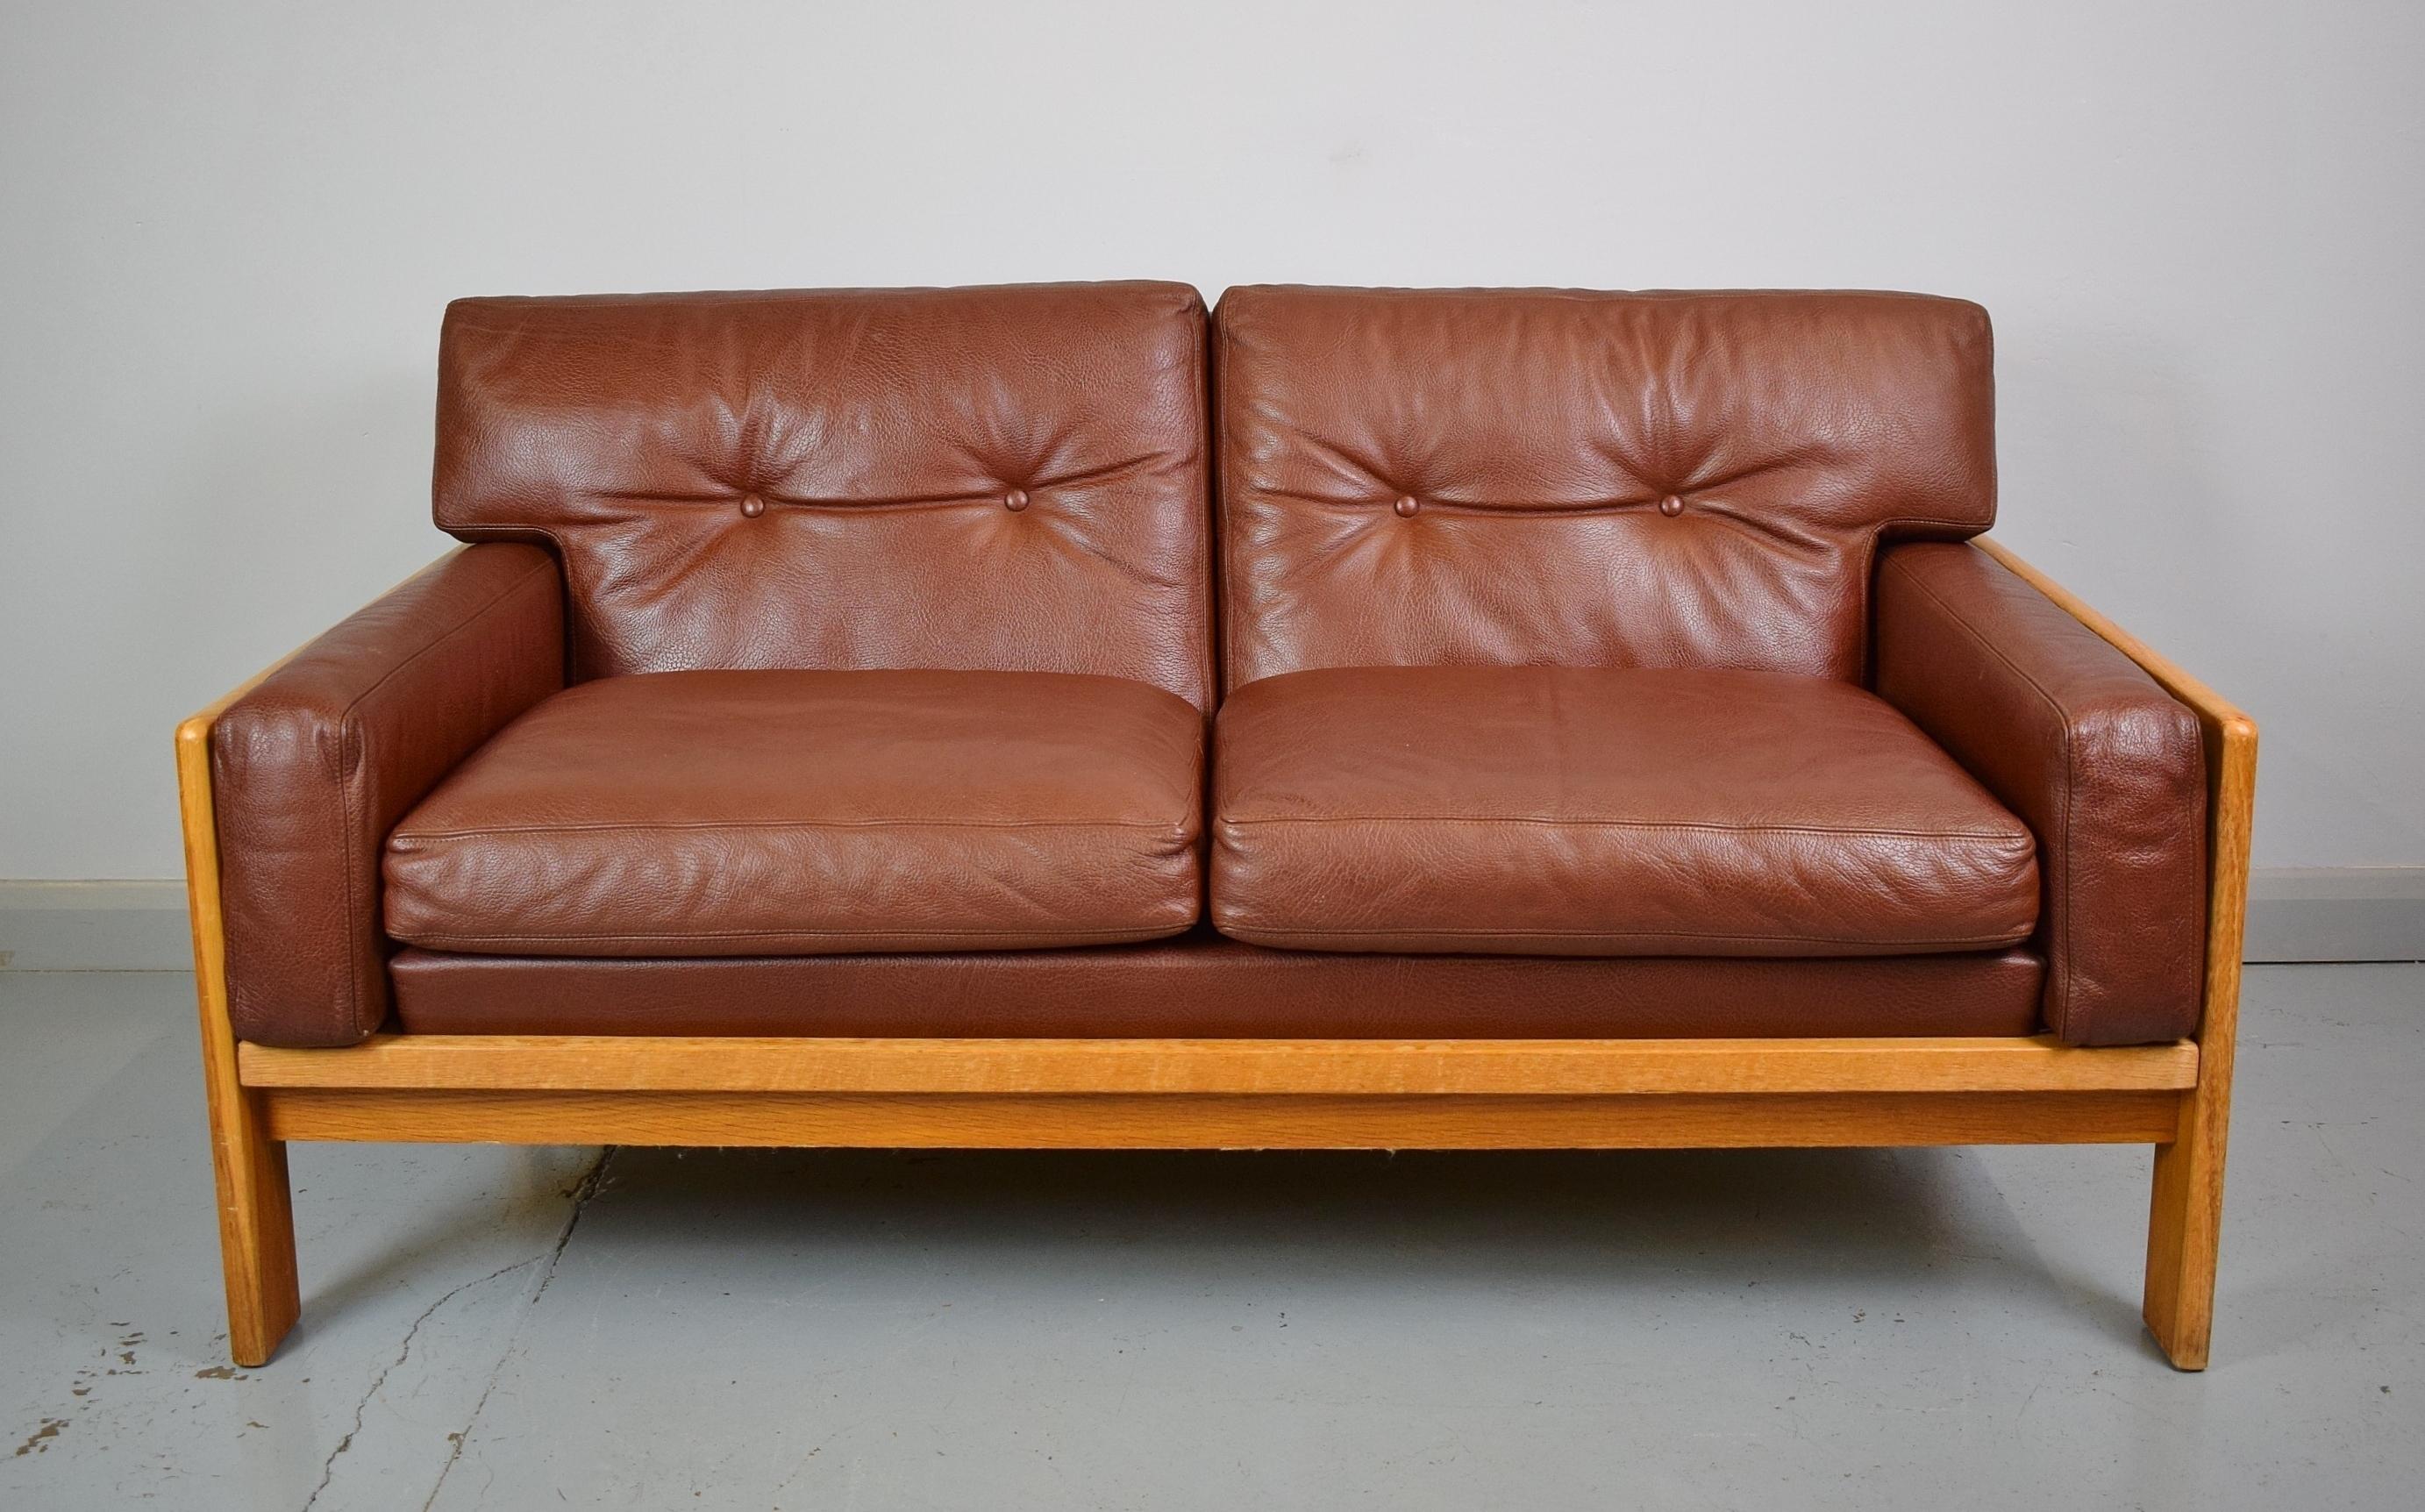 Admirable Mid Century Retro Danish Cognac Leather 2 Seat Sofa Loveseat Oak Frame 1970S Machost Co Dining Chair Design Ideas Machostcouk